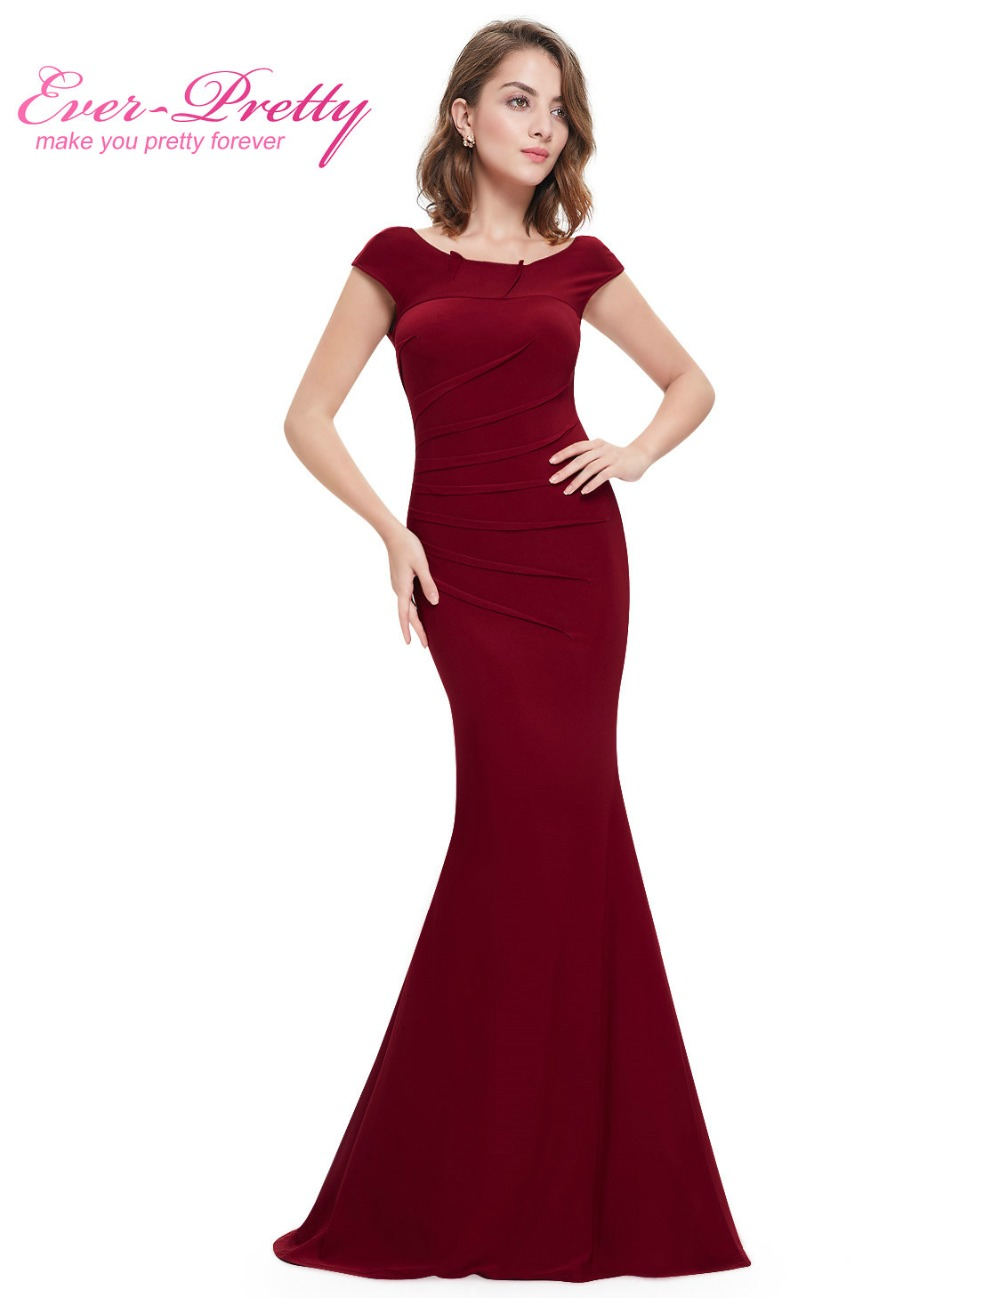 Online Get Cheap Special Event Dress -Aliexpress.com | Alibaba Group